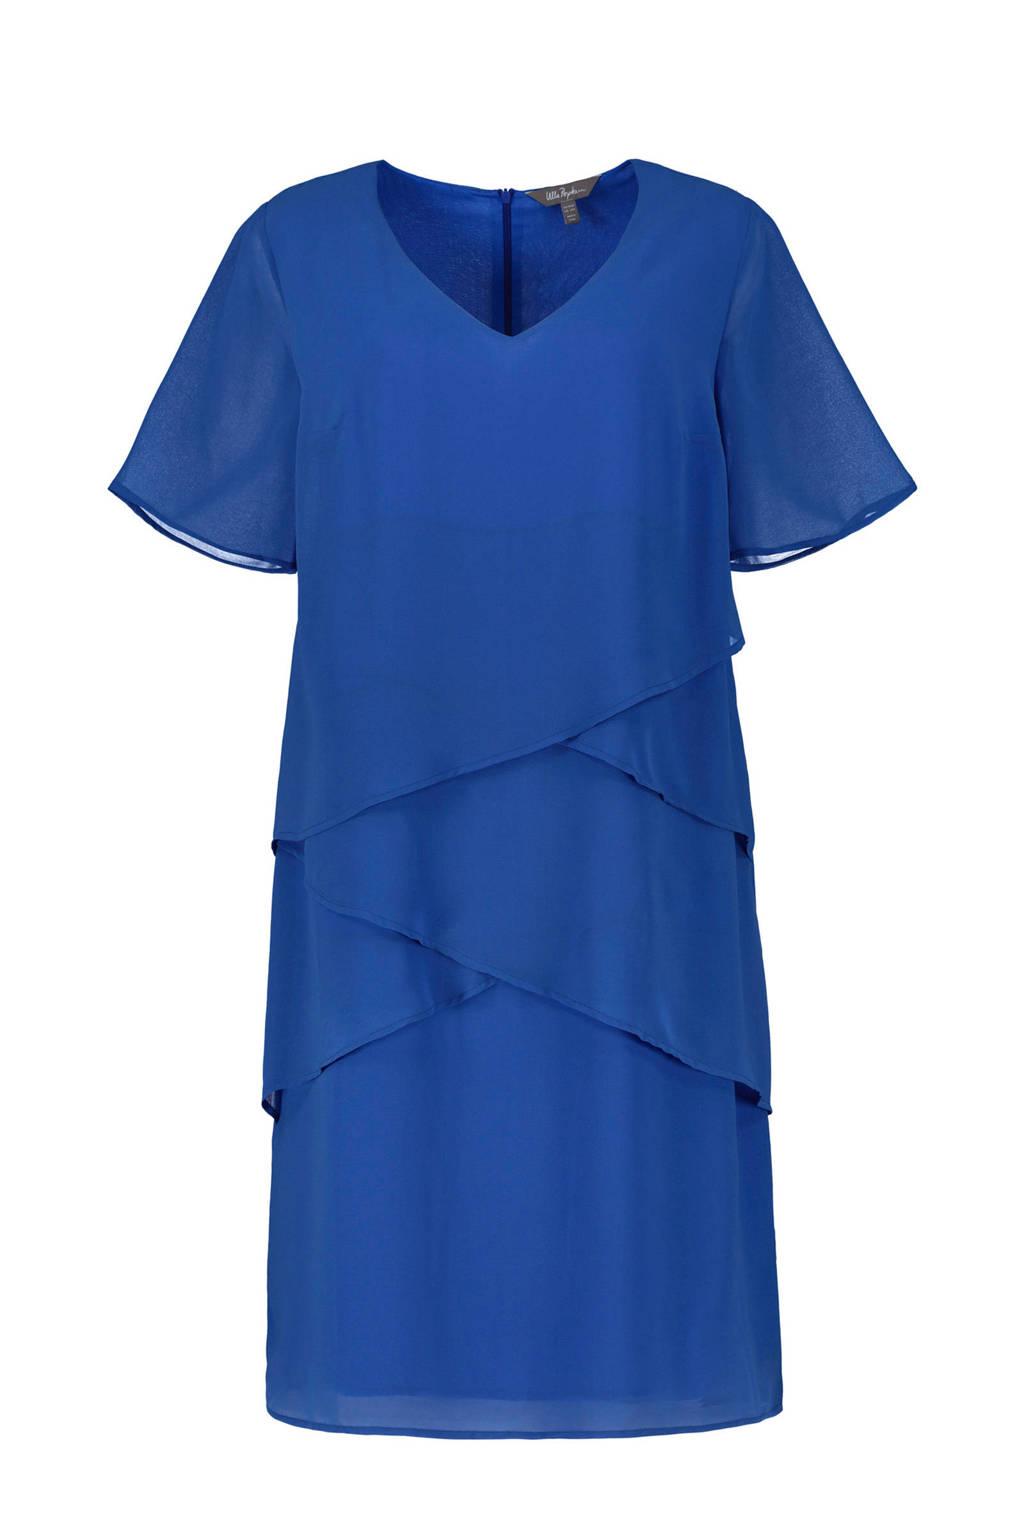 Ulla Popken jurk blauw, Blauw